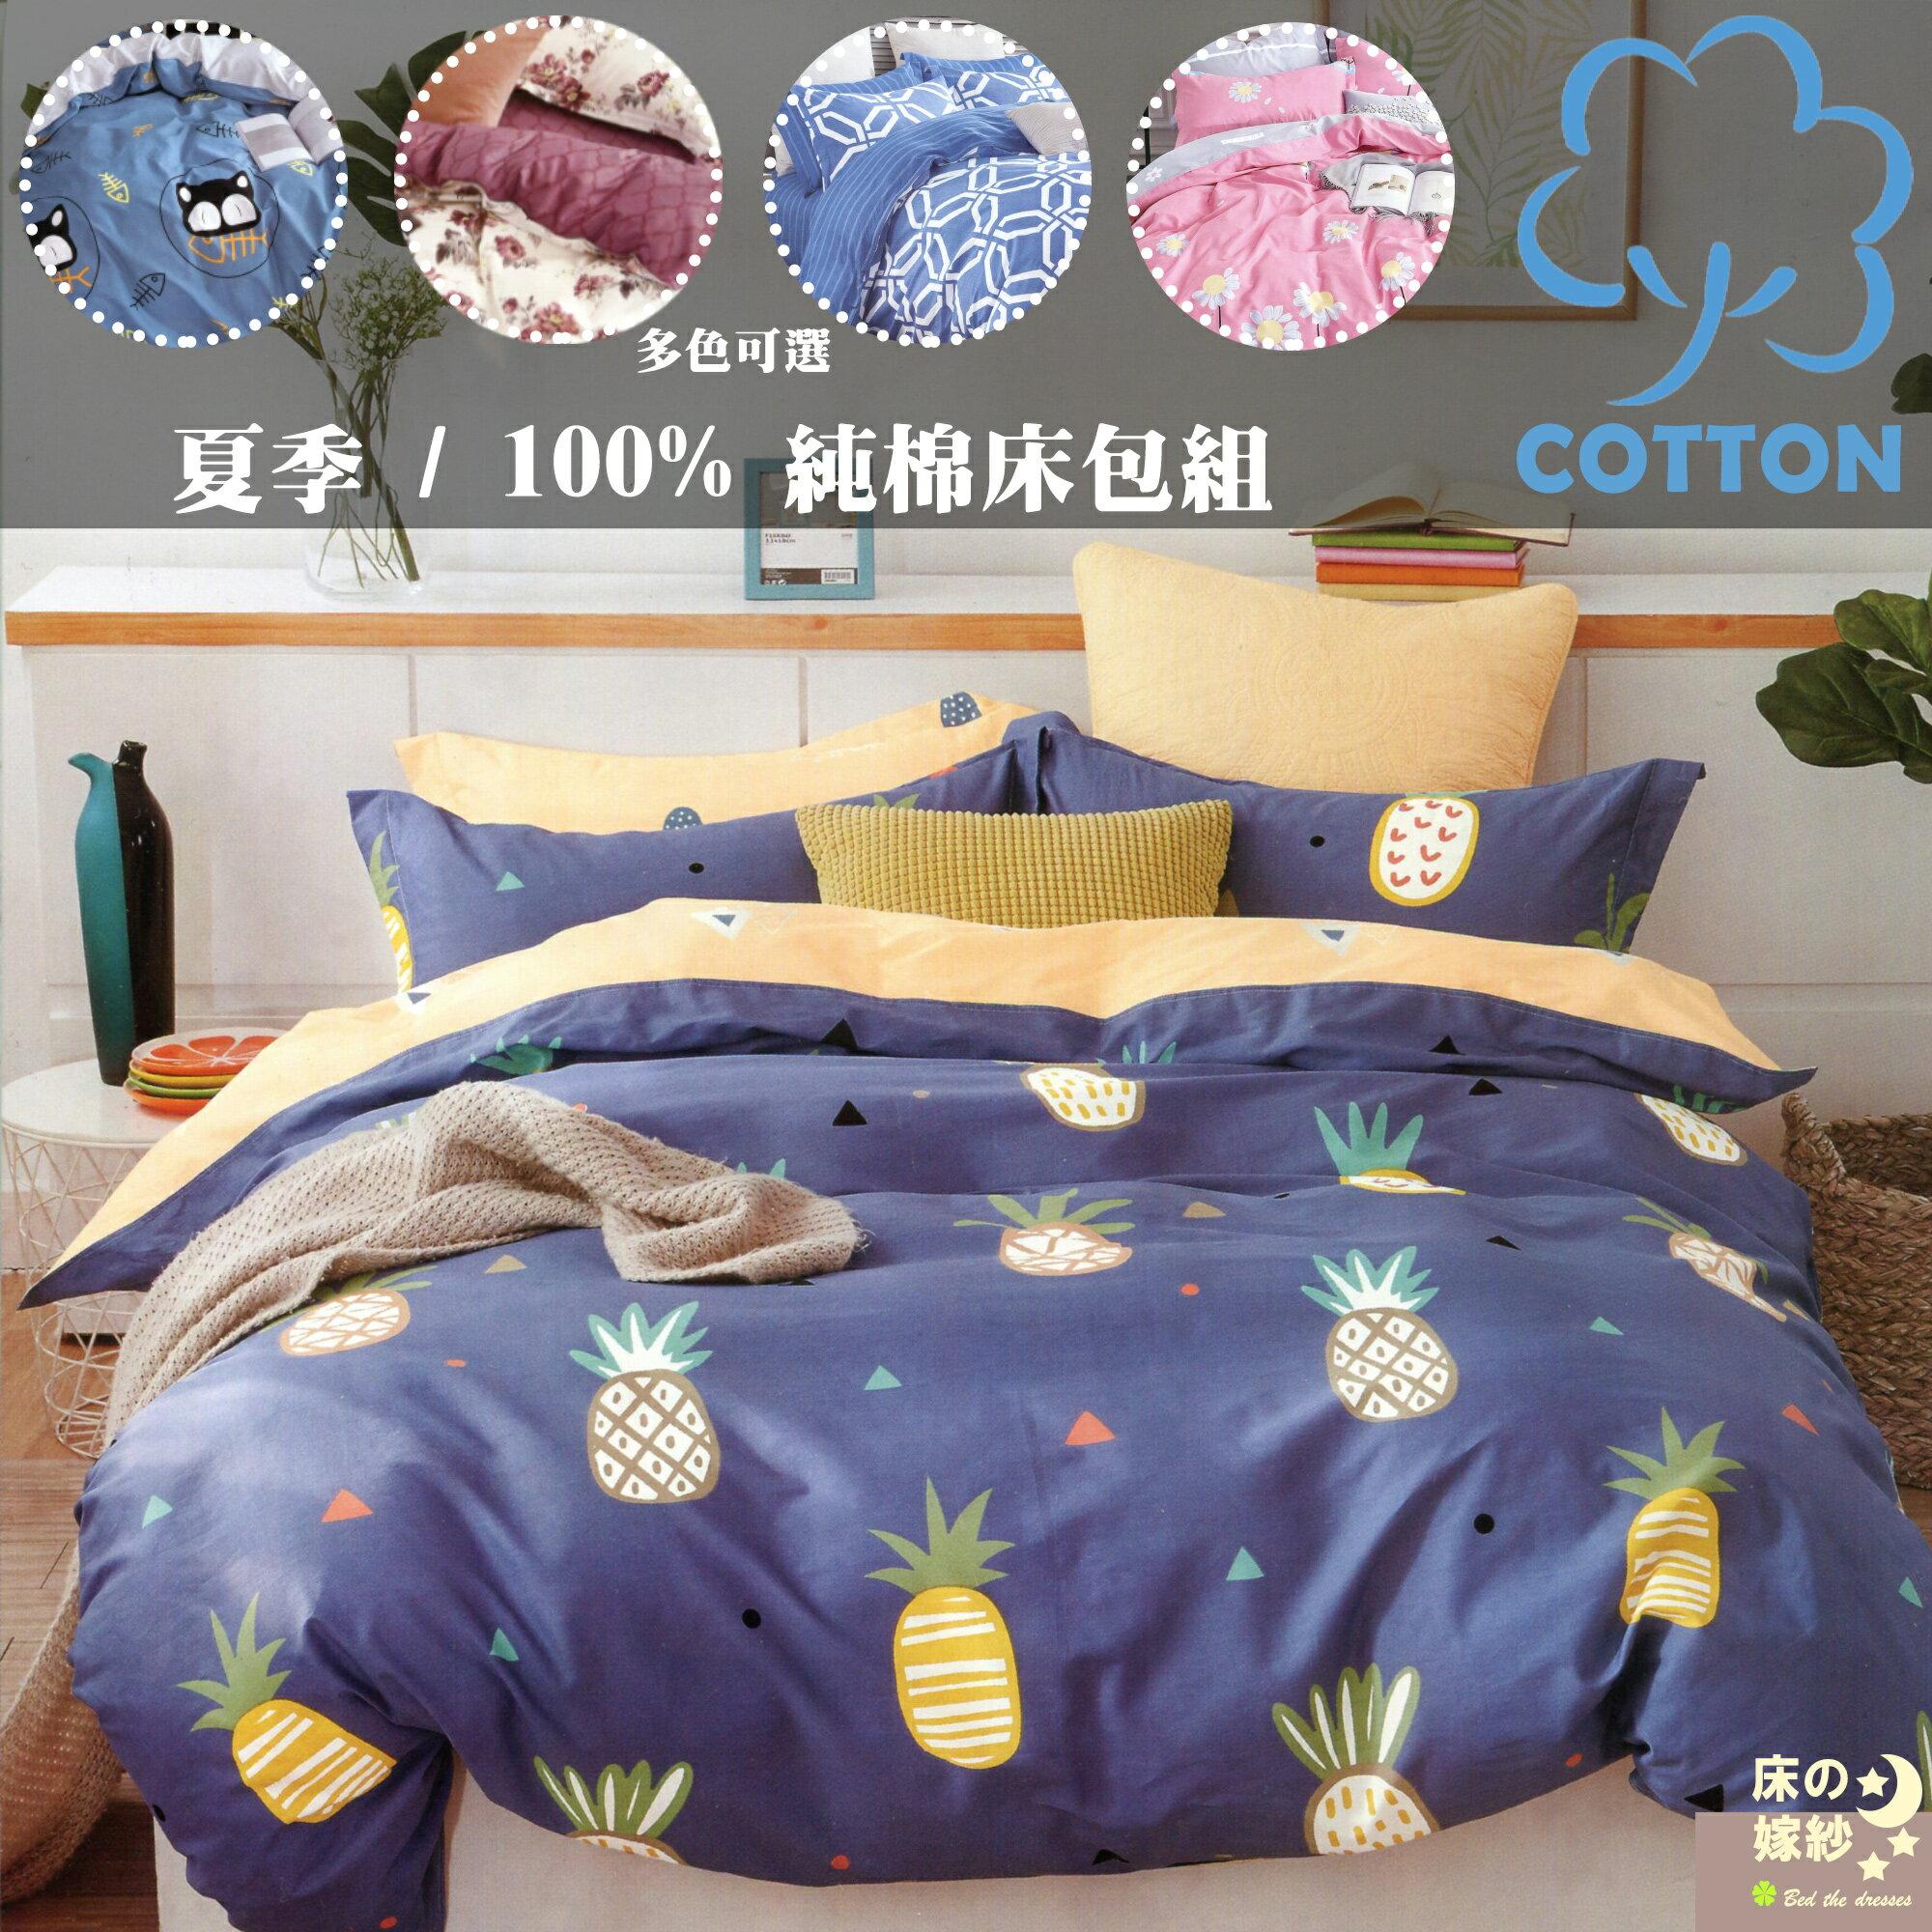 Q床の嫁紗Q 100% 純棉床包組 / 涼被 / 兩用被 自由配 / 35公分加高型床包讓您床再高也不怕